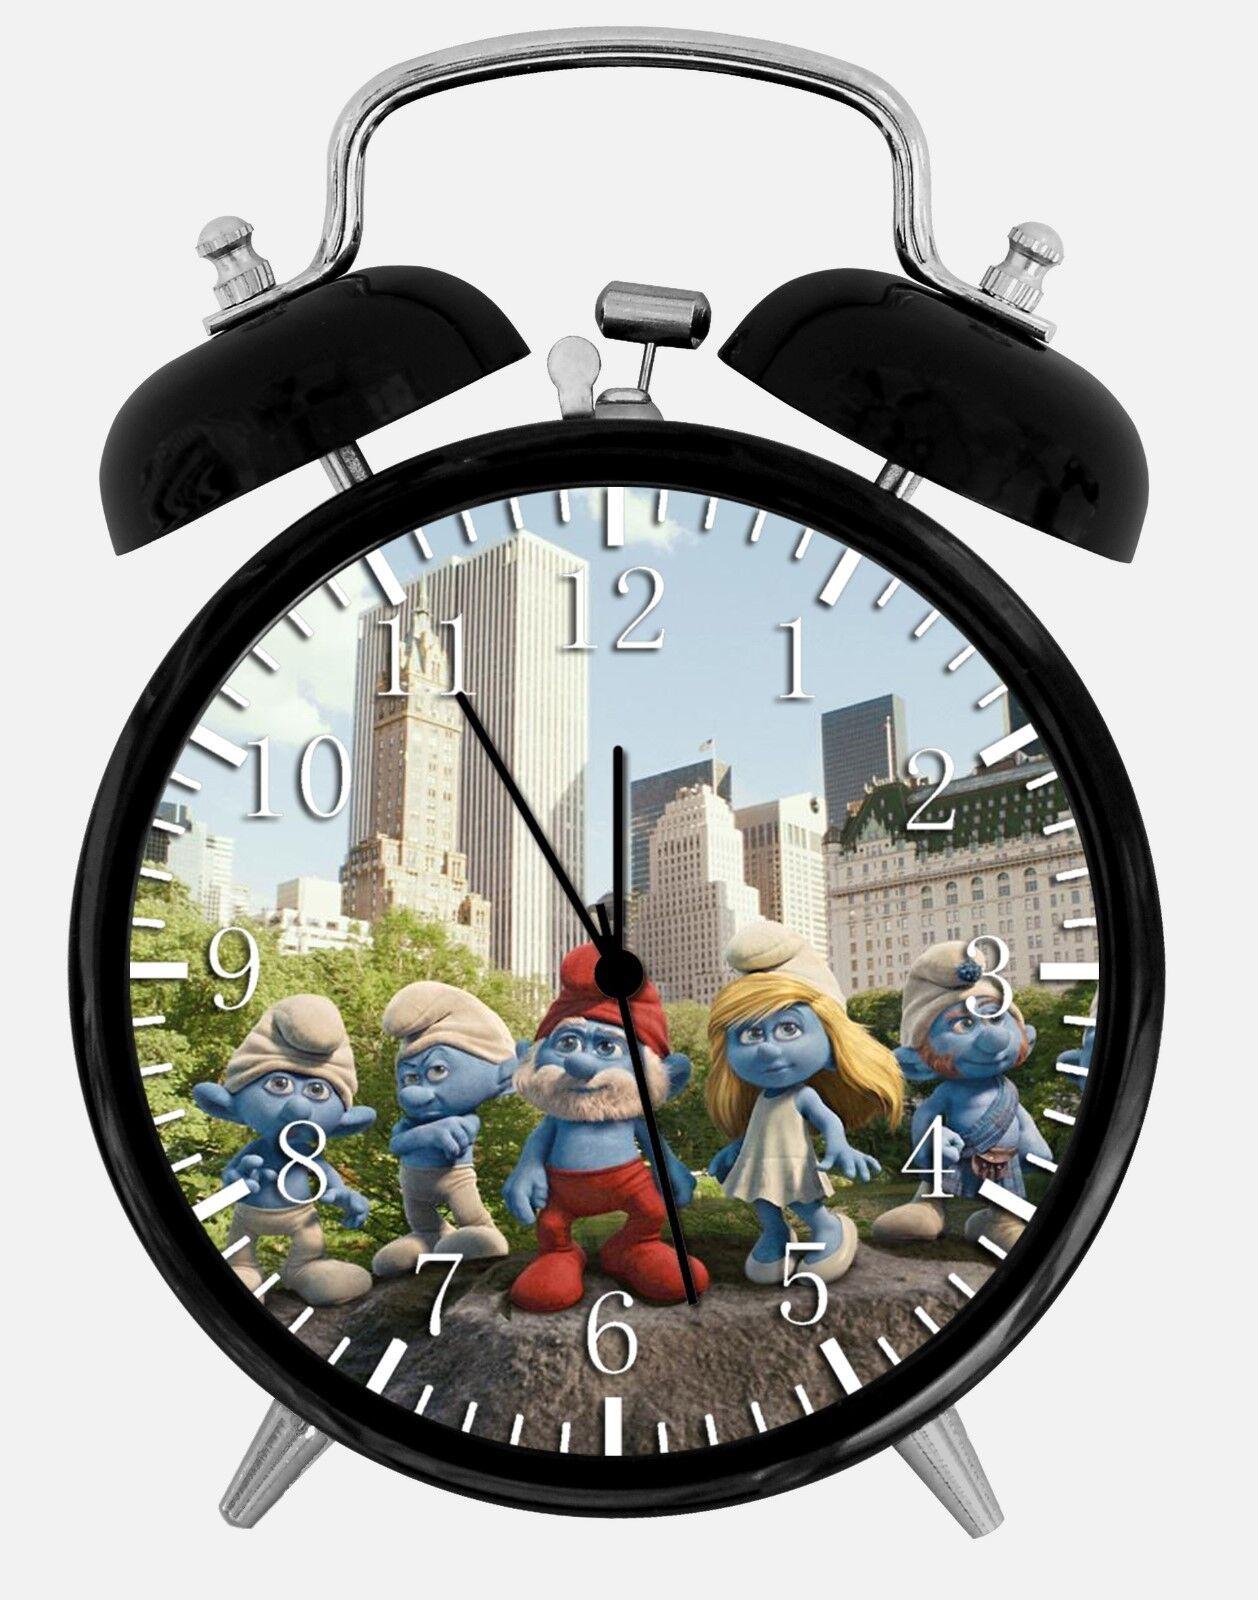 "The Smurfs Alarm Desk Clock 3.75"" Room Office Decor W259 Nice For Gift"